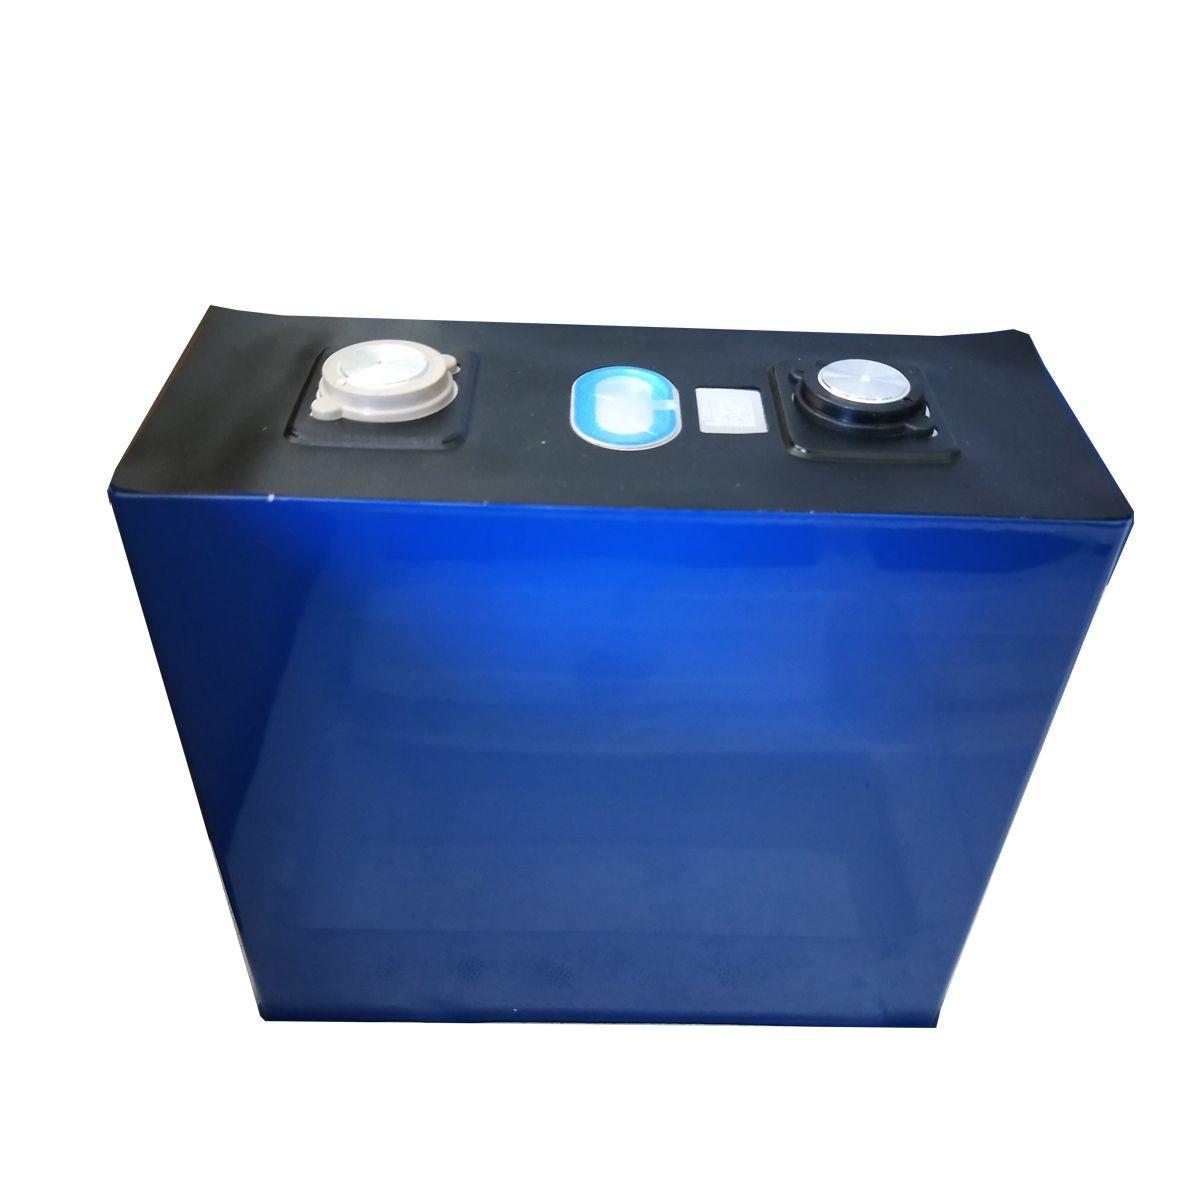 8 stücke Catl A Grade 3.2V 271Ah Batterie Tiefzyklus Prismatic 3c LifeePo4 280Ah